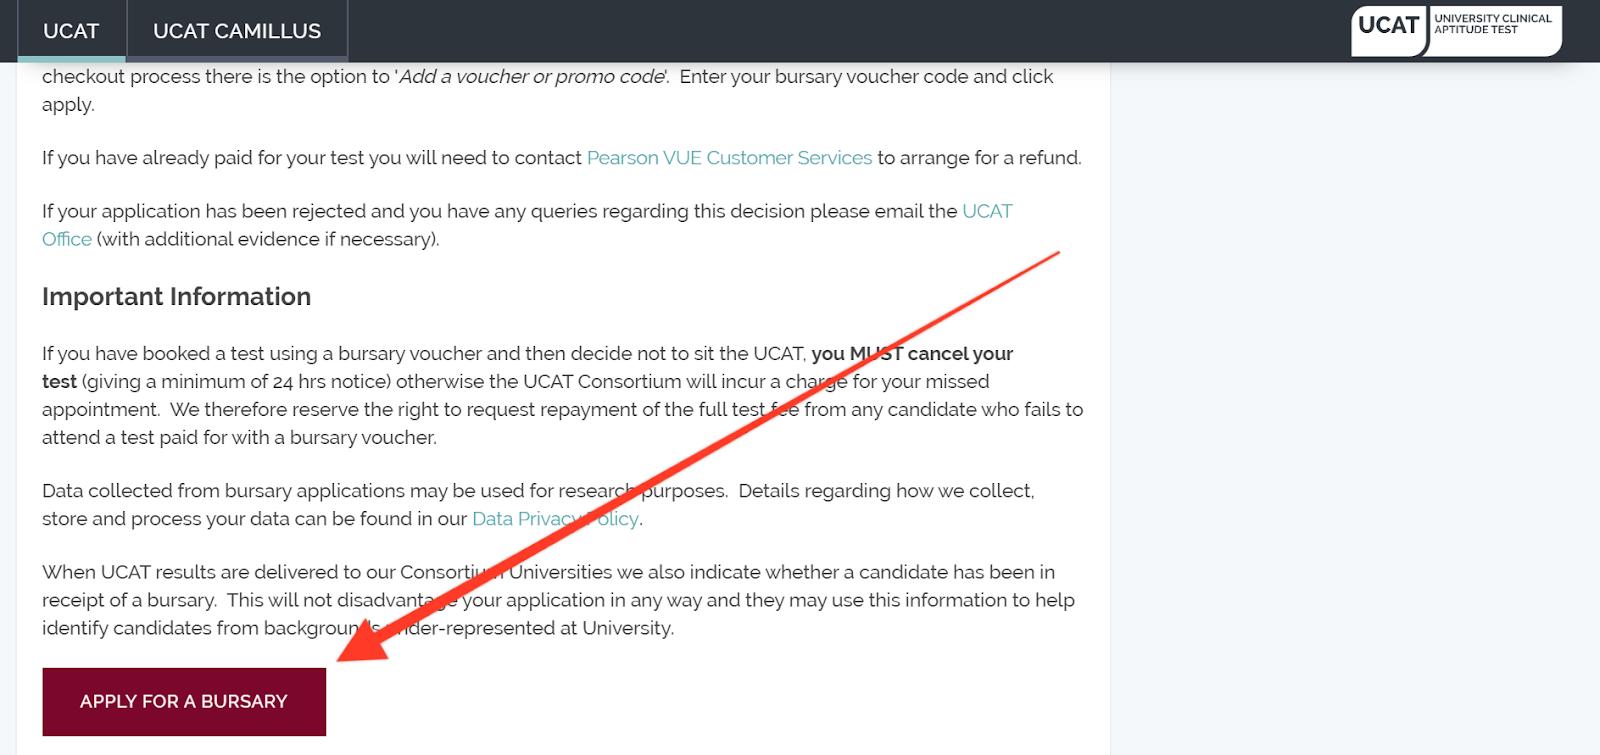 Applying for a UCAT Bursary Scheme in the UCAT official website